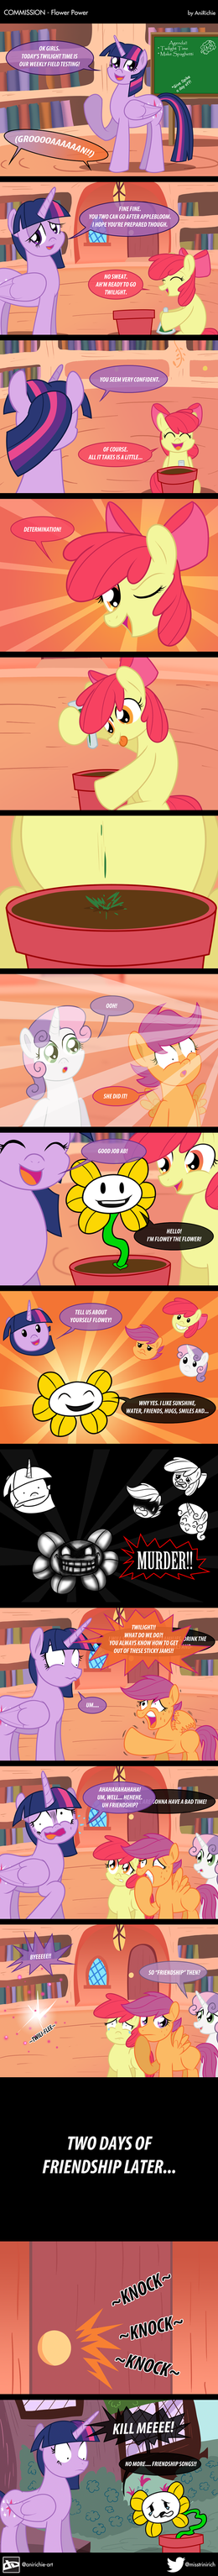 COM - Flower Power (COMIC) by AniRichie-Art